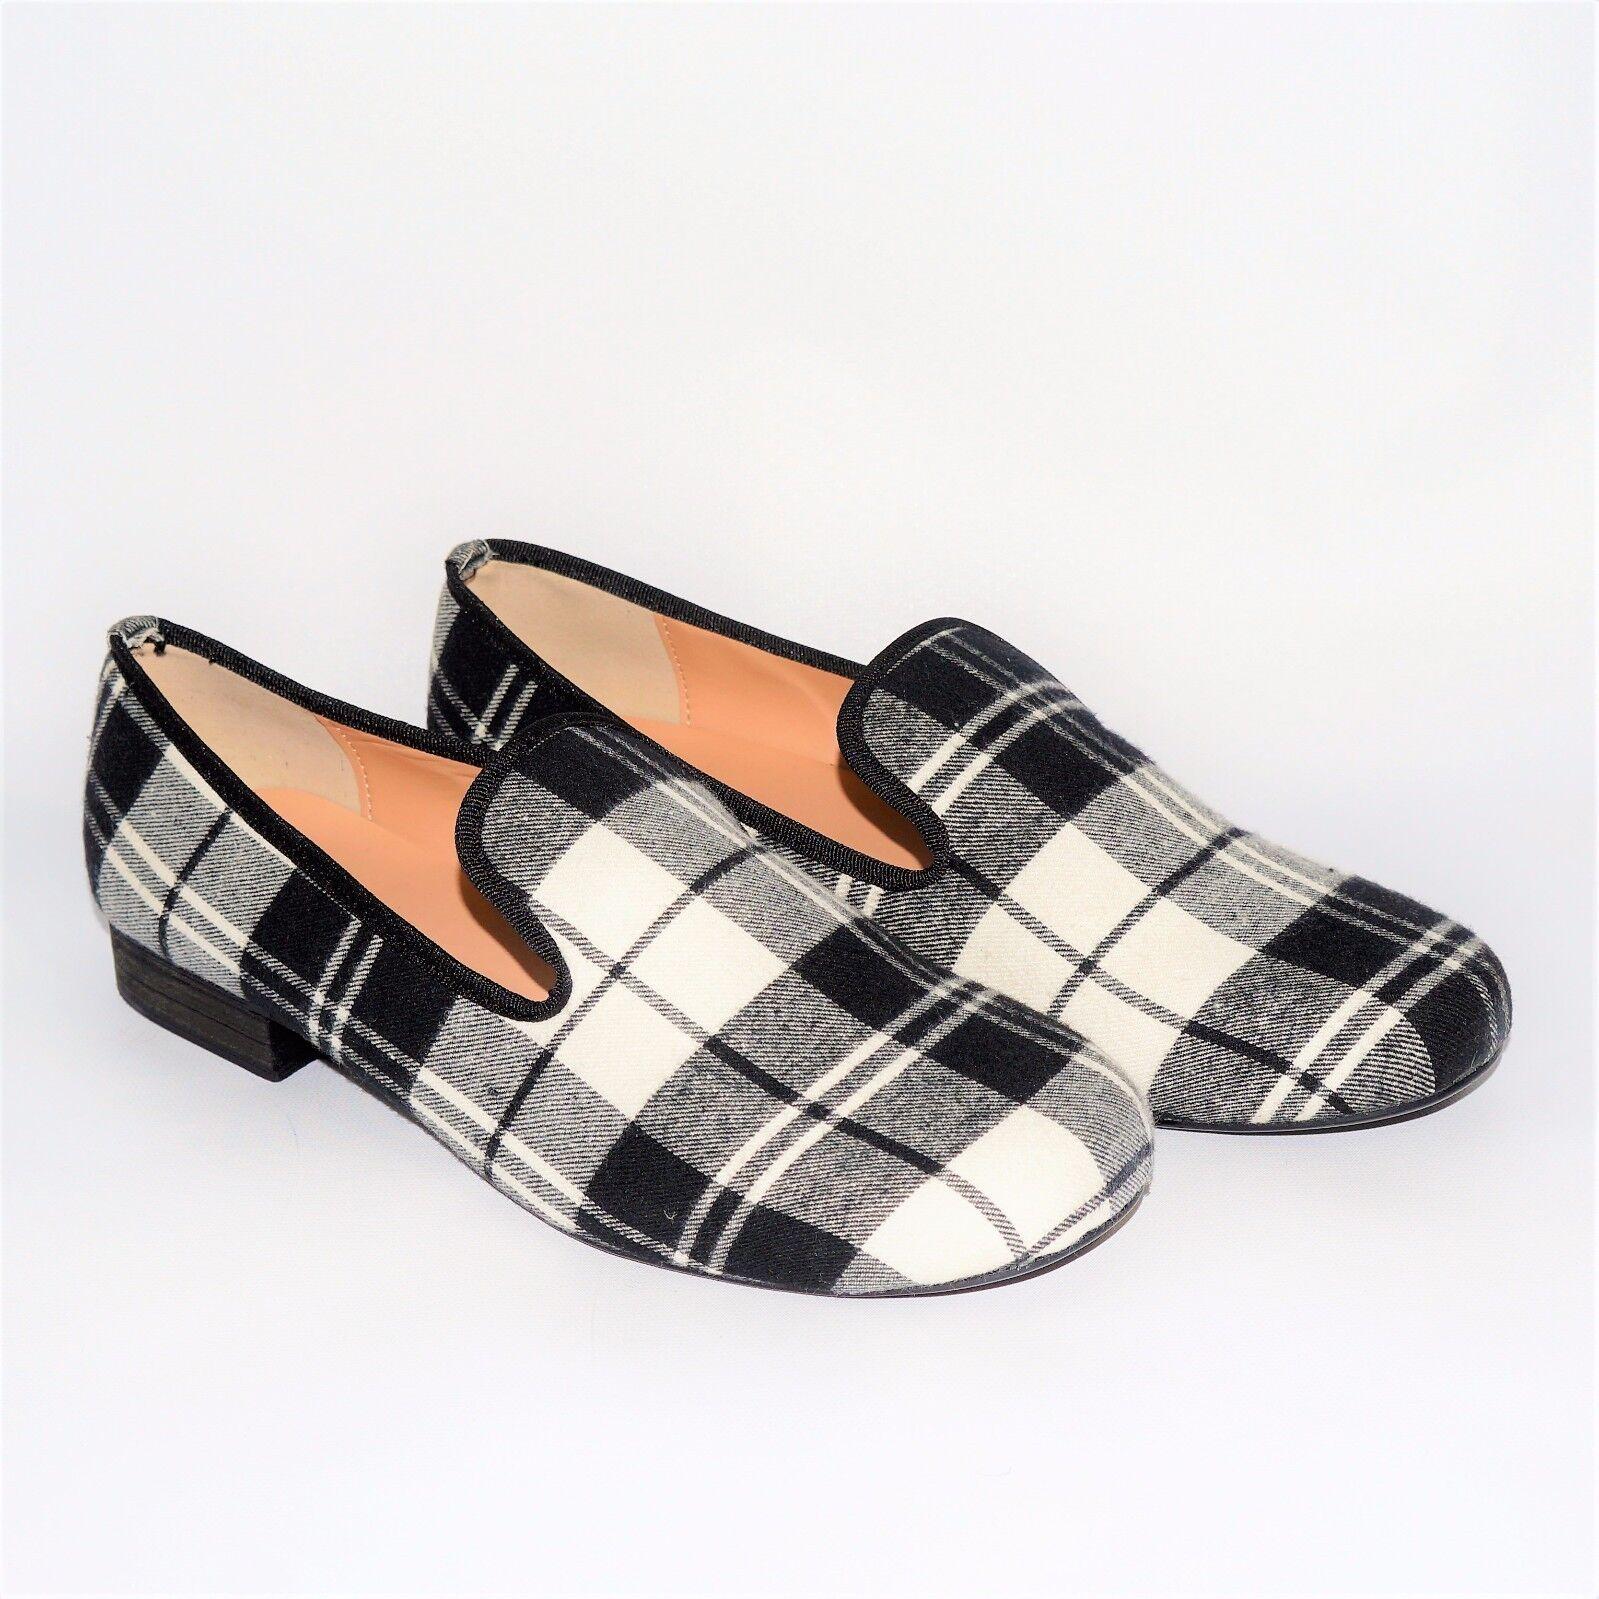 Uomo Fashion Luxury Plaid Slippers Loafer Scarpe